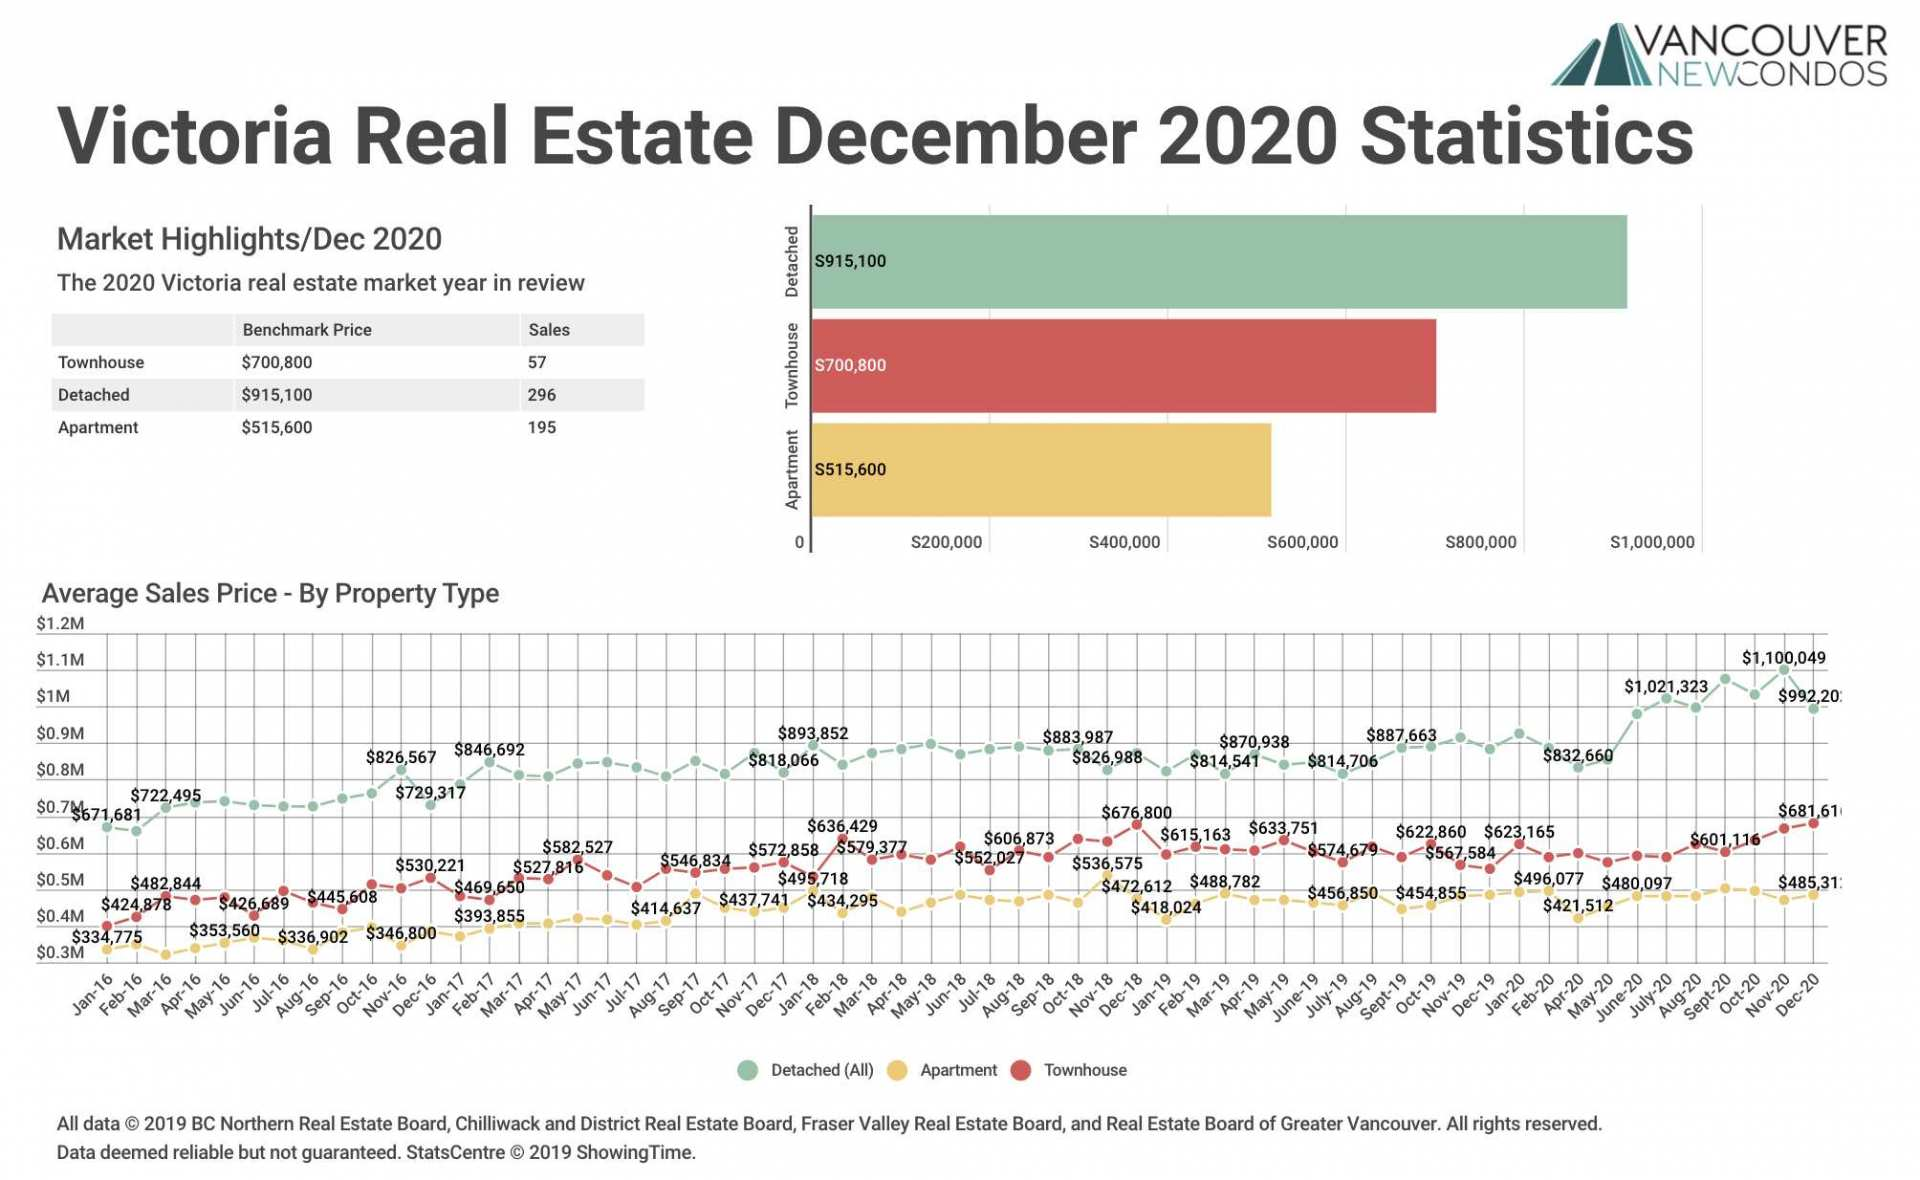 VREB Dec 2020 Stats Graph